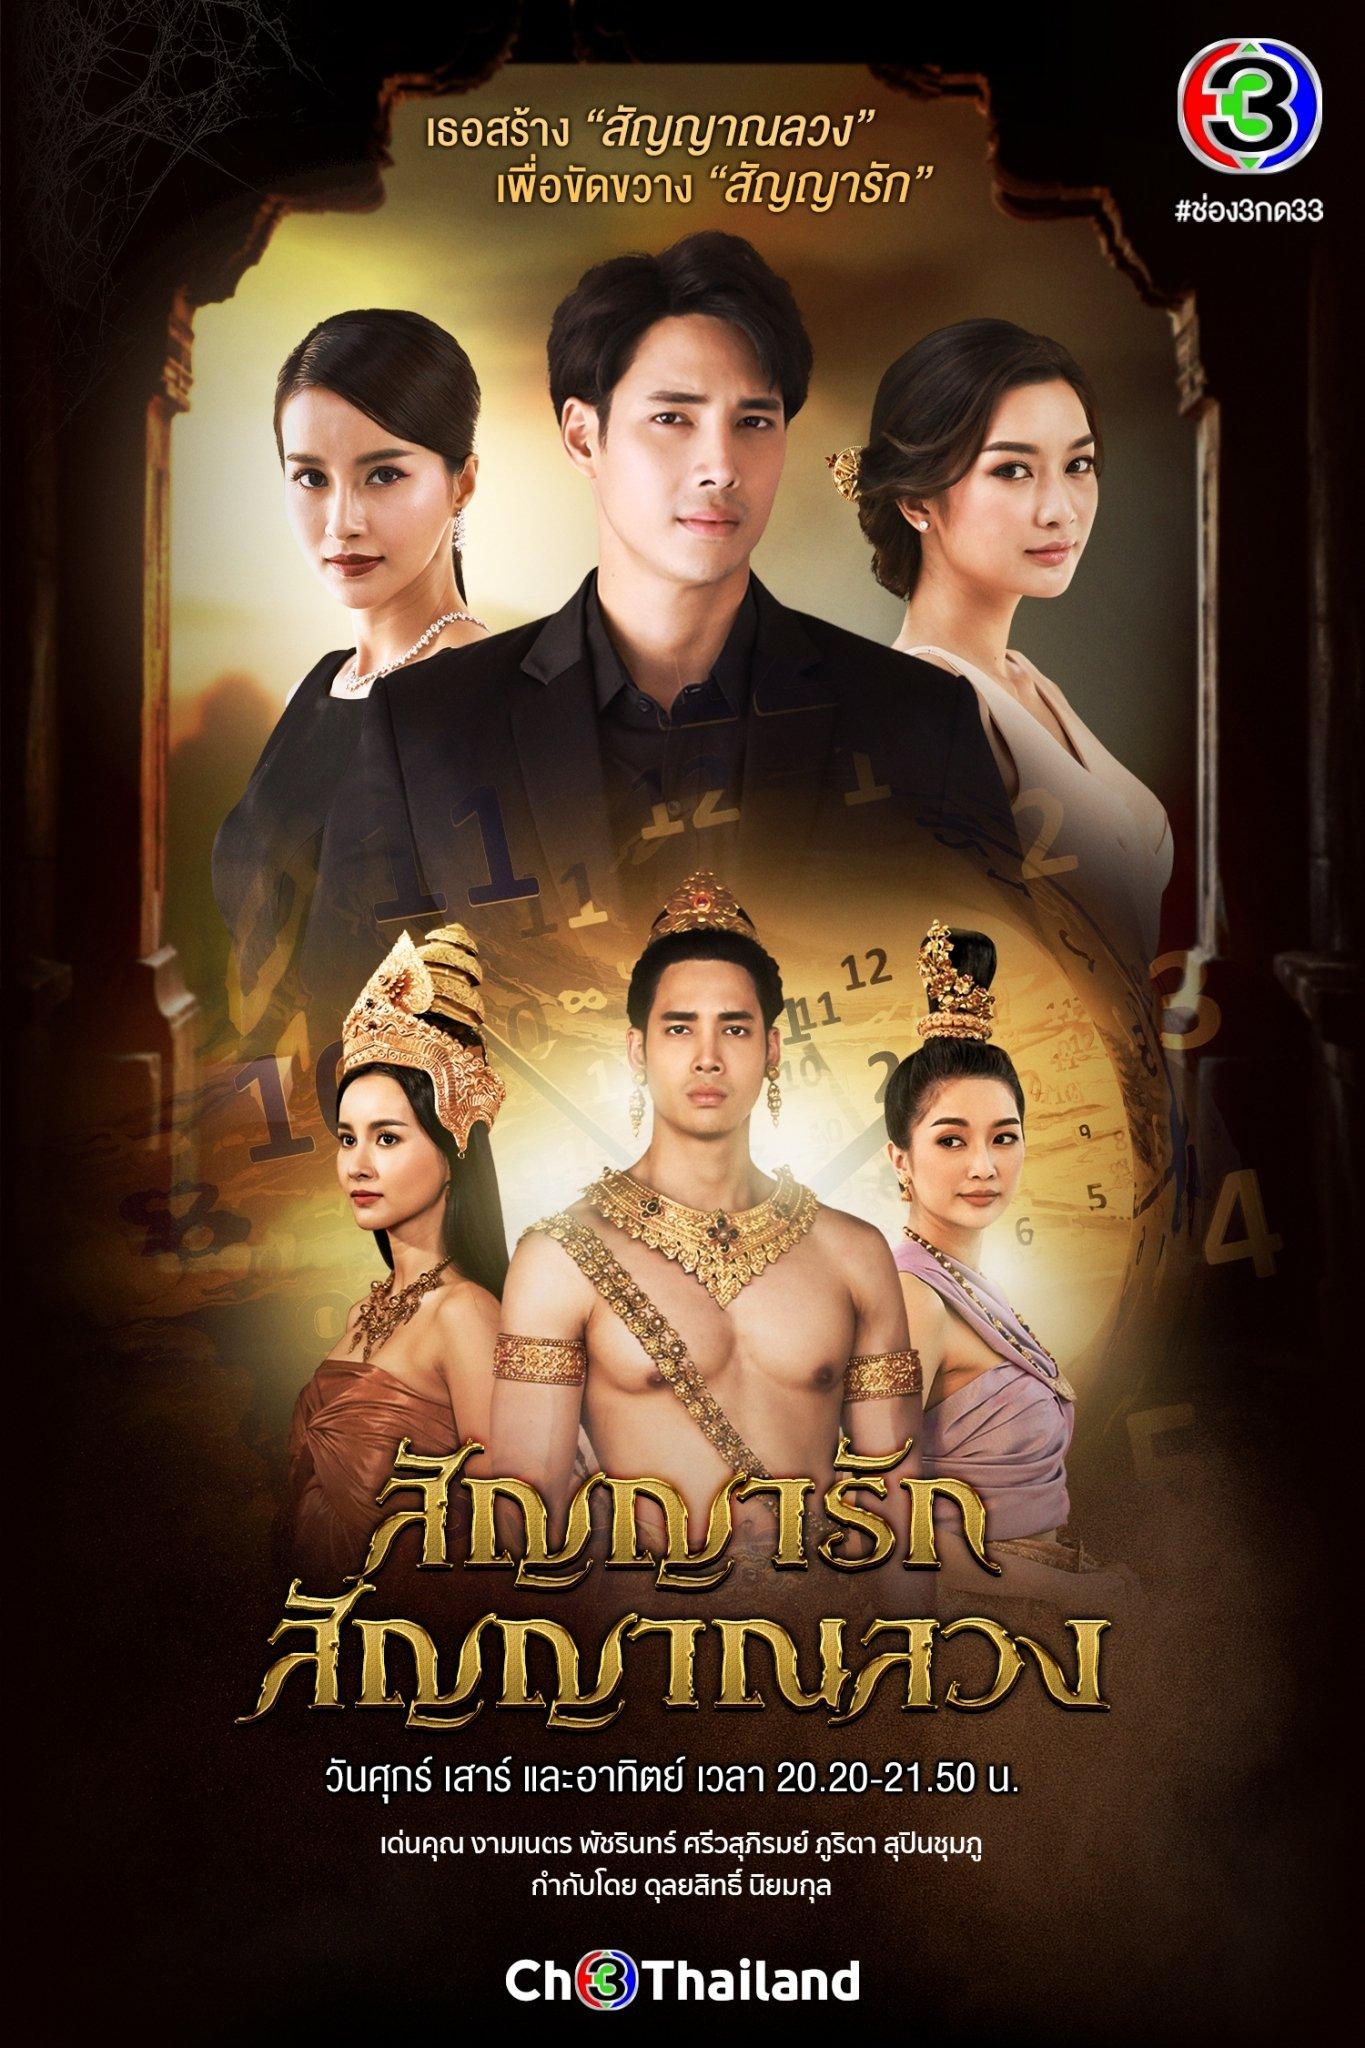 Sunya Ruk Sunya Luang